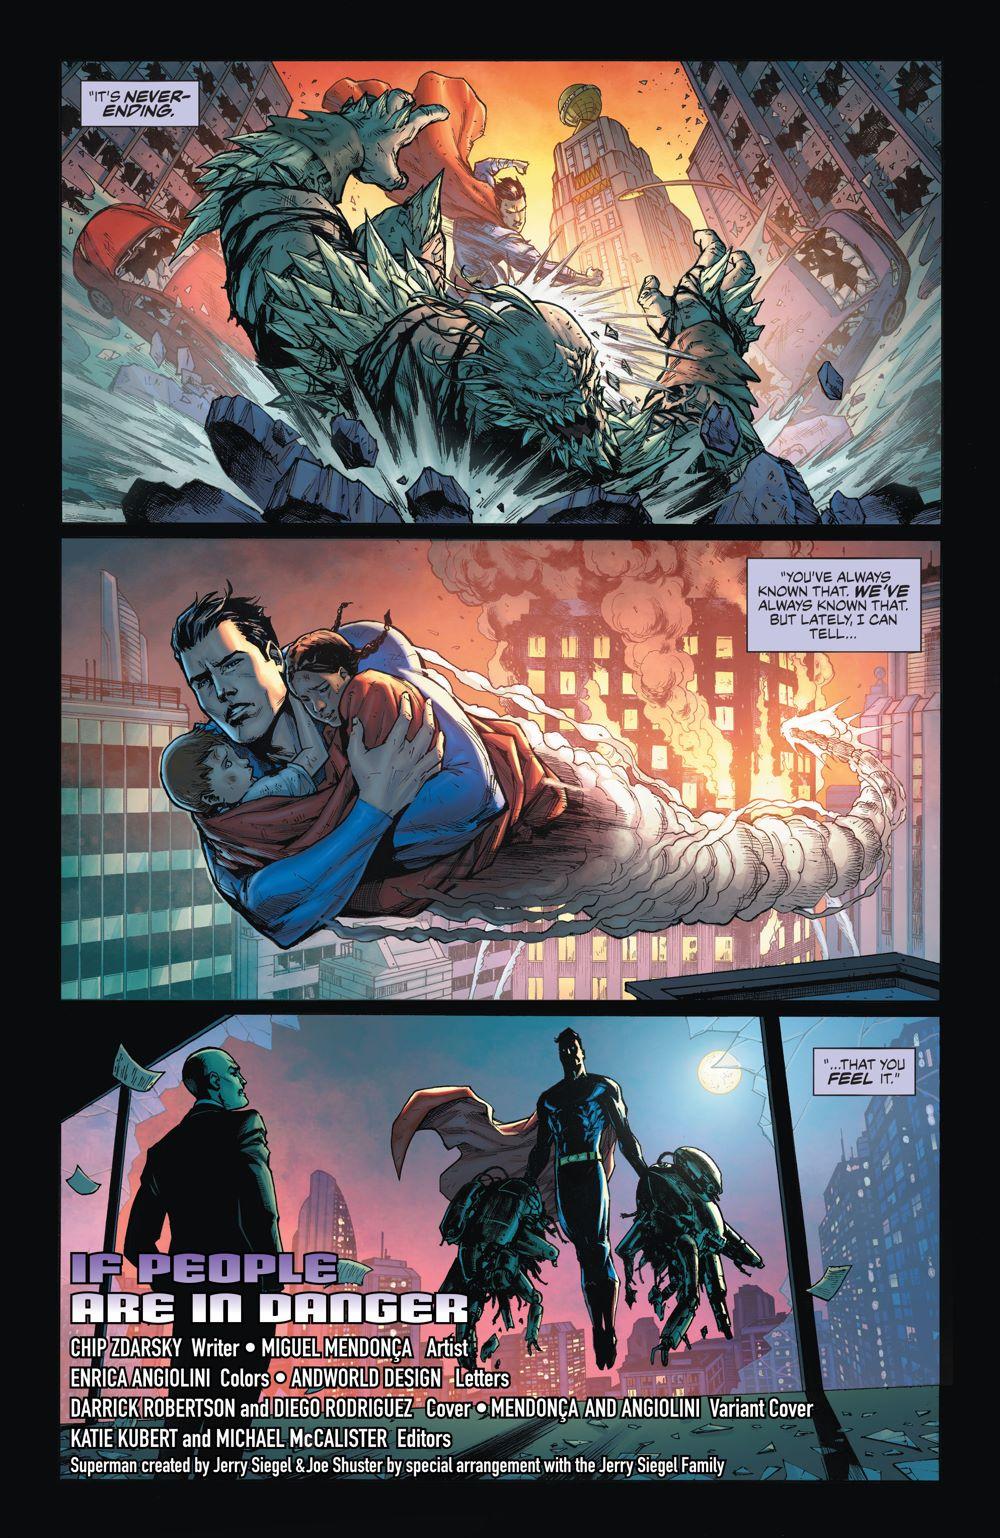 Justice-League-Last-Ride-1-3_60935c00ef0148.65320069 ComicList Previews: JUSTICE LEAGUE LAST RIDE #1